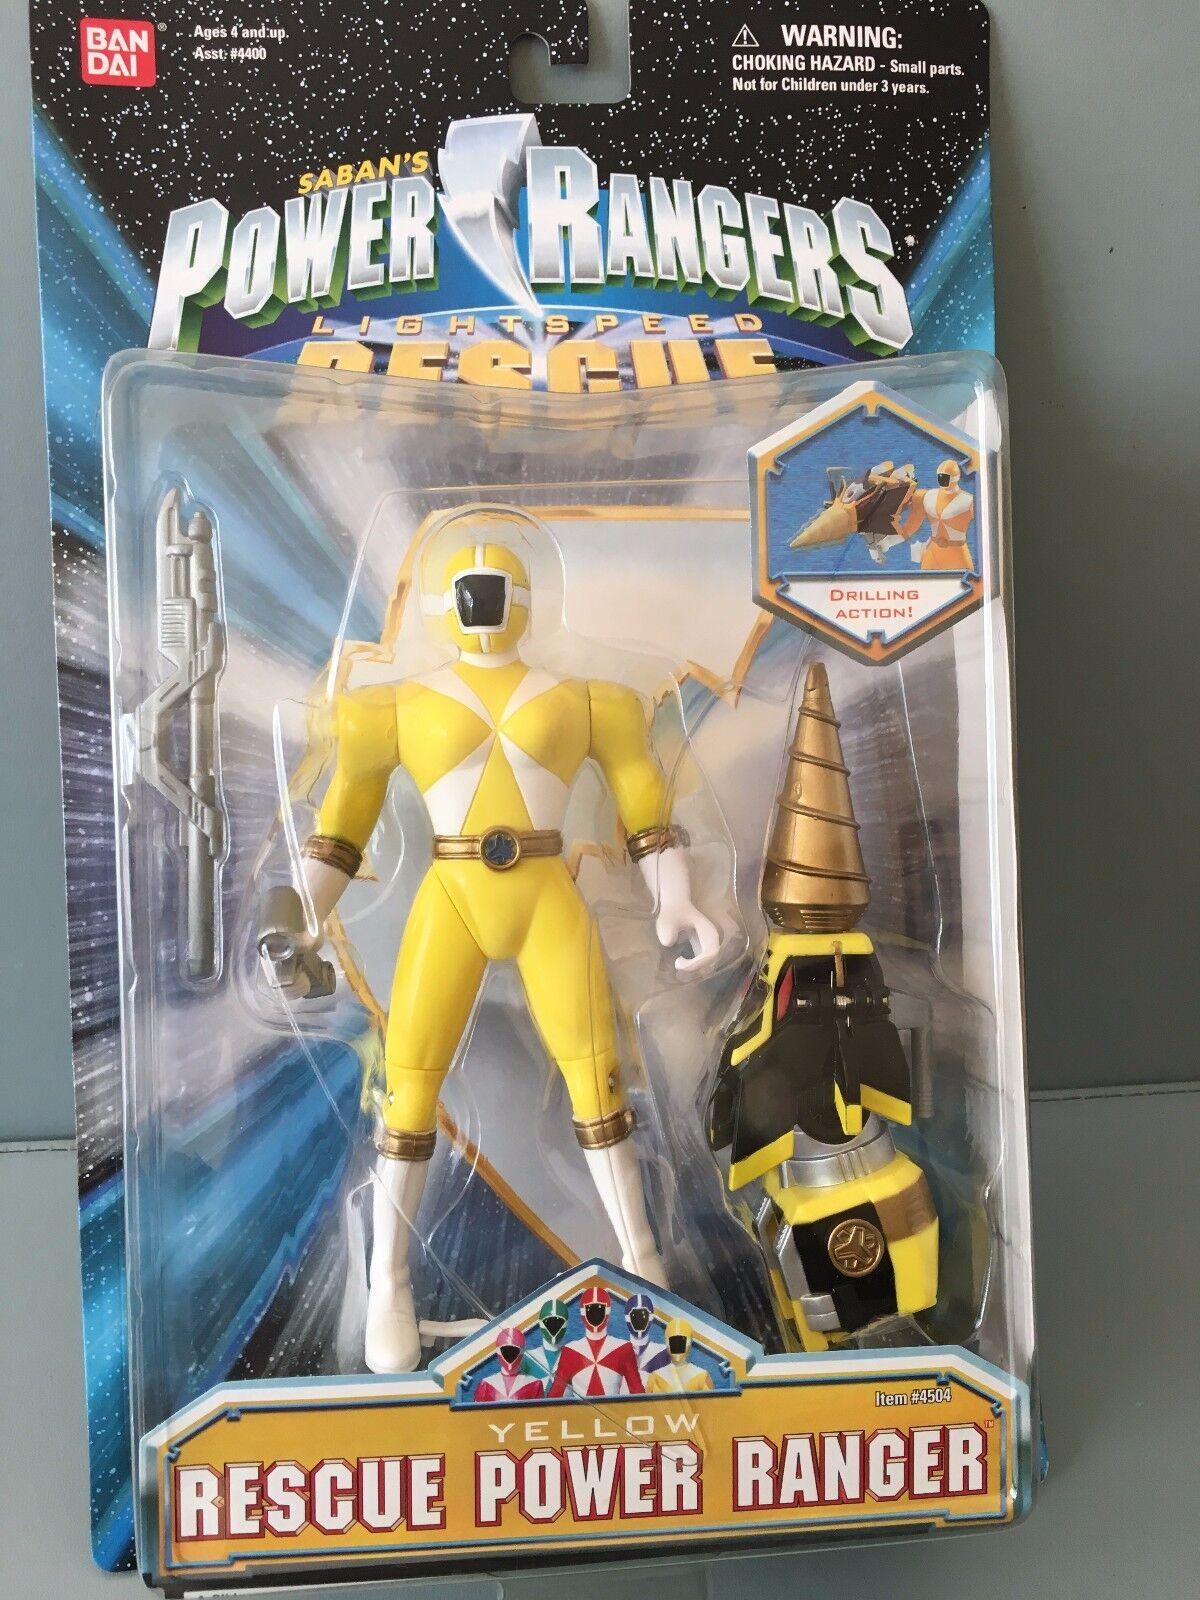 Power rangers lightspeed rettungs - gelbe ranger in versiegelten blisterpackung